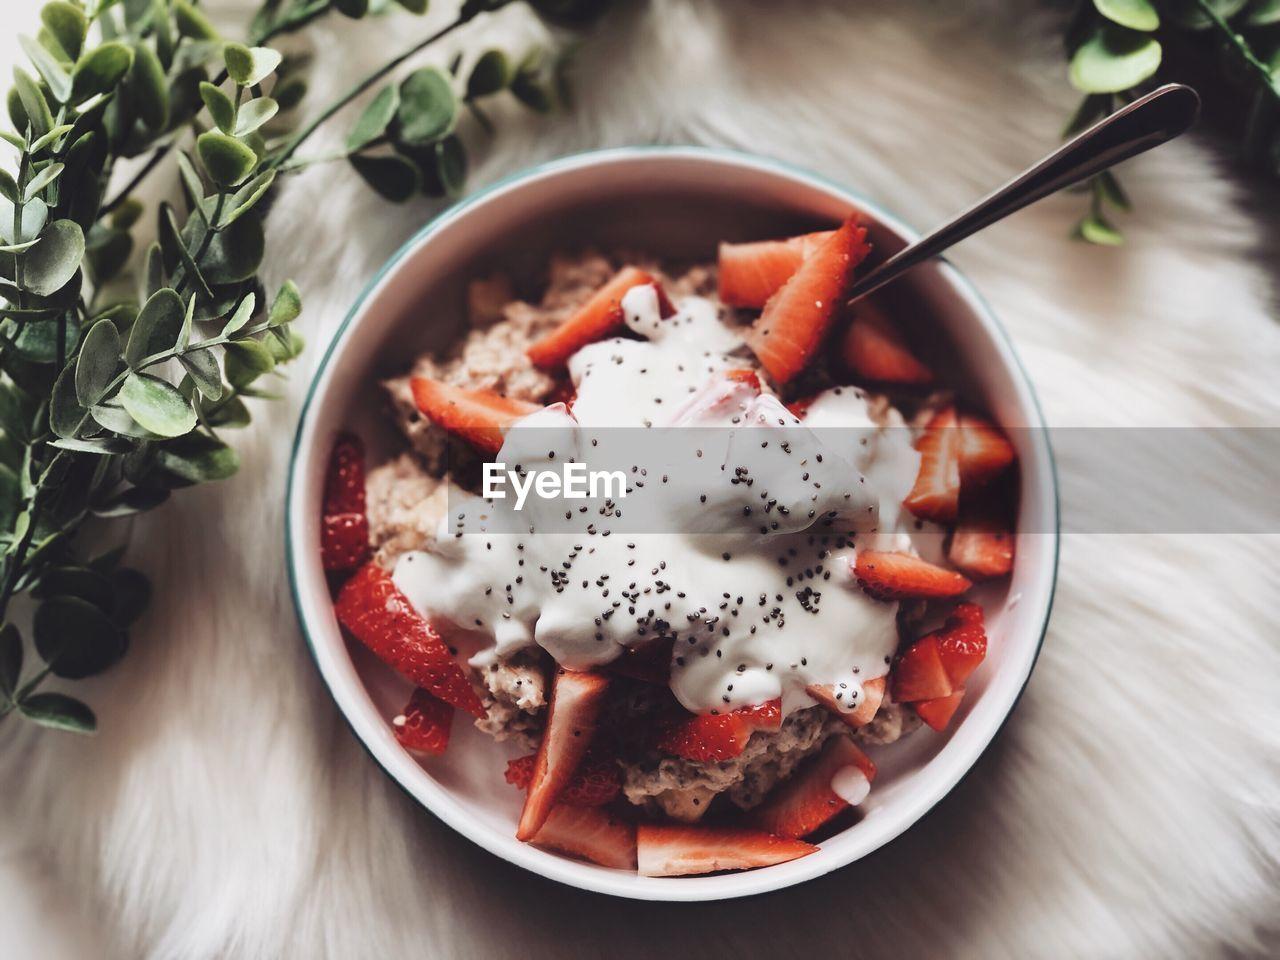 Breakfast in bowl on table